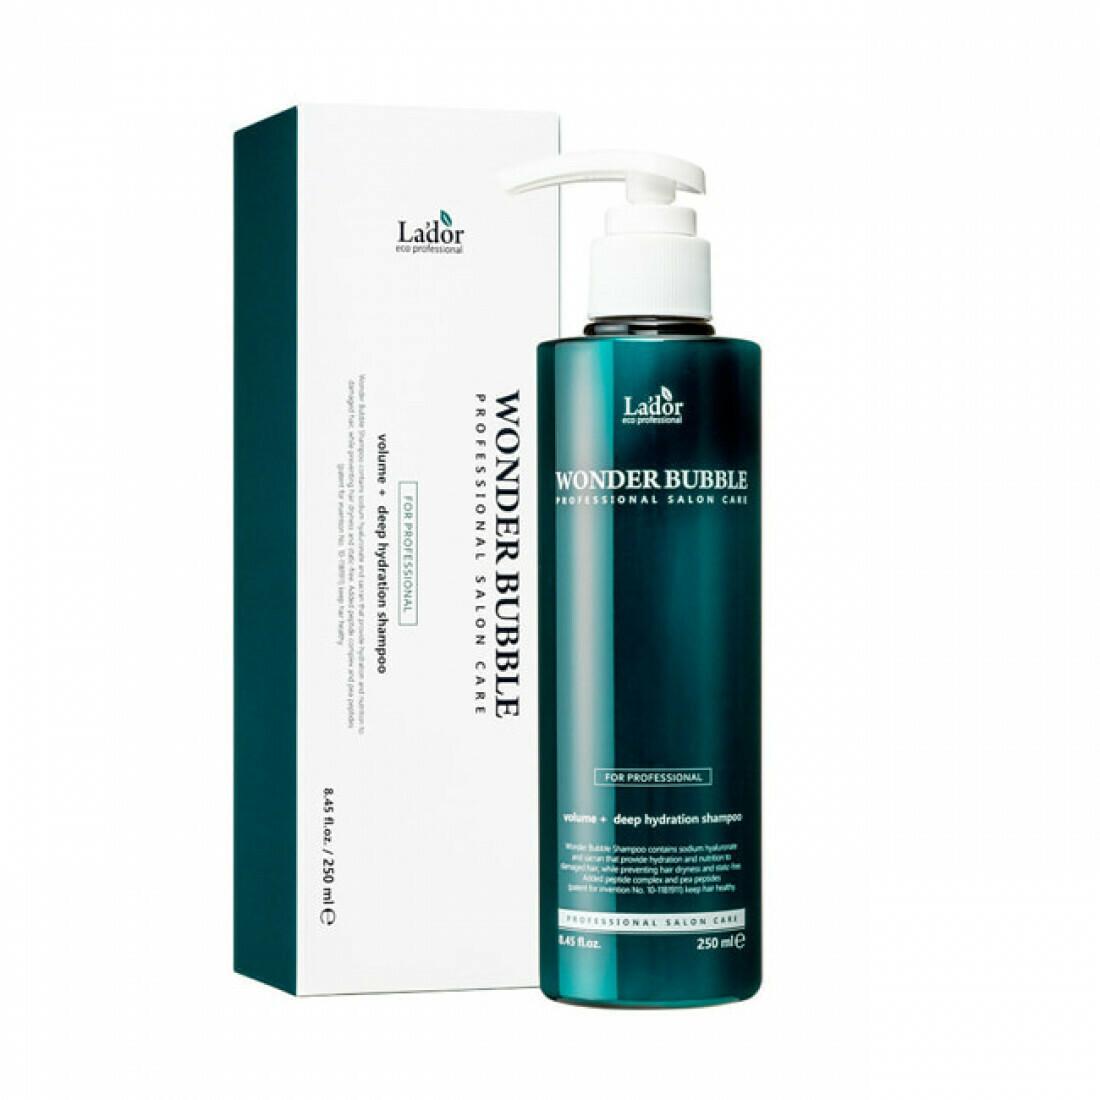 Шампунь для волос La'dor Wonder Bubble Shampoo 250 мл